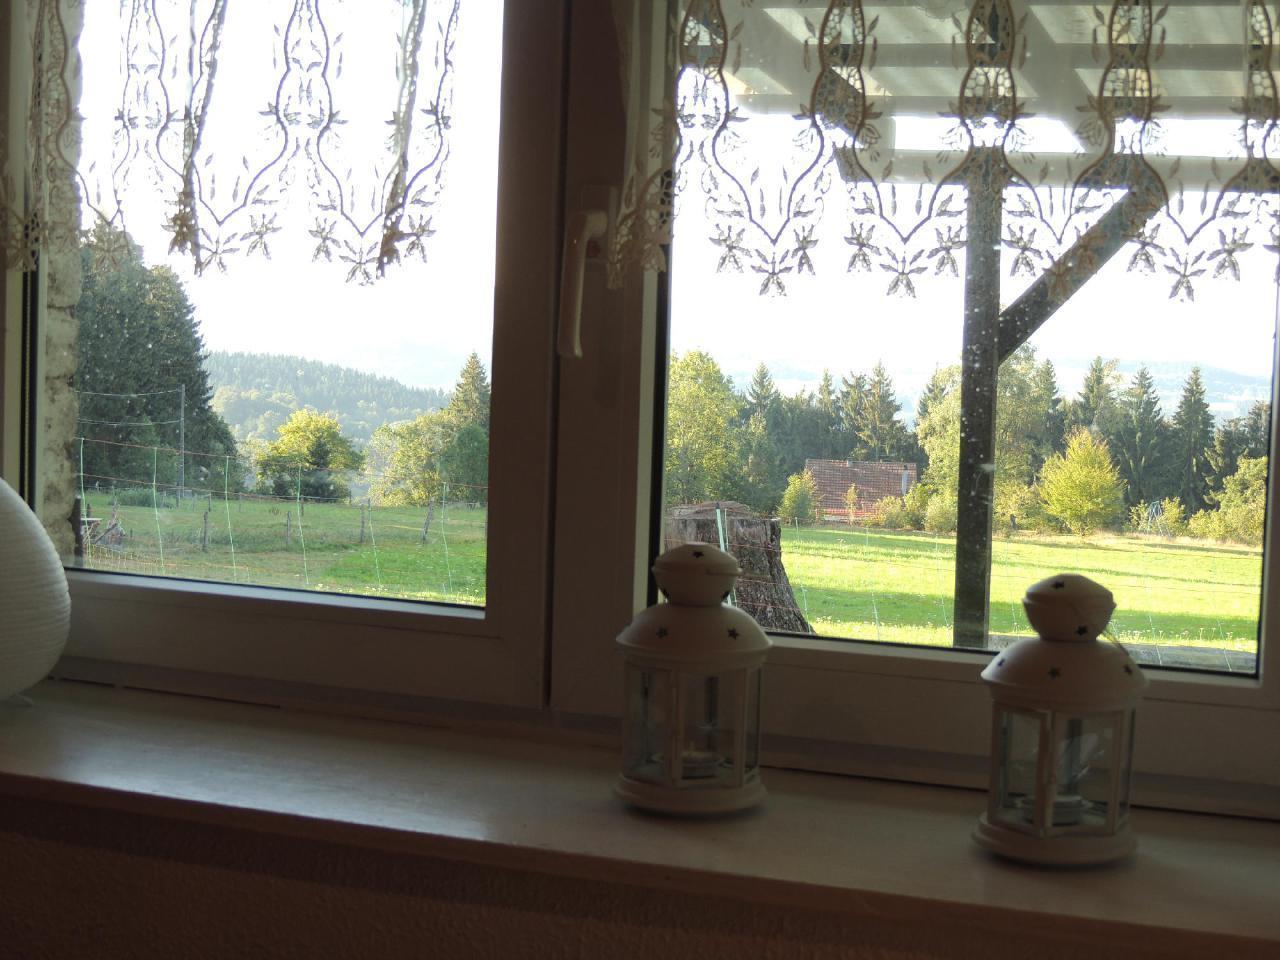 Ferienhaus Steinhäuschen Shila, im Naturparc der Vogesen,  mit Saunahaus (1717460), La Rosière, Haute-Saône, Franche-Comté, Frankreich, Bild 11